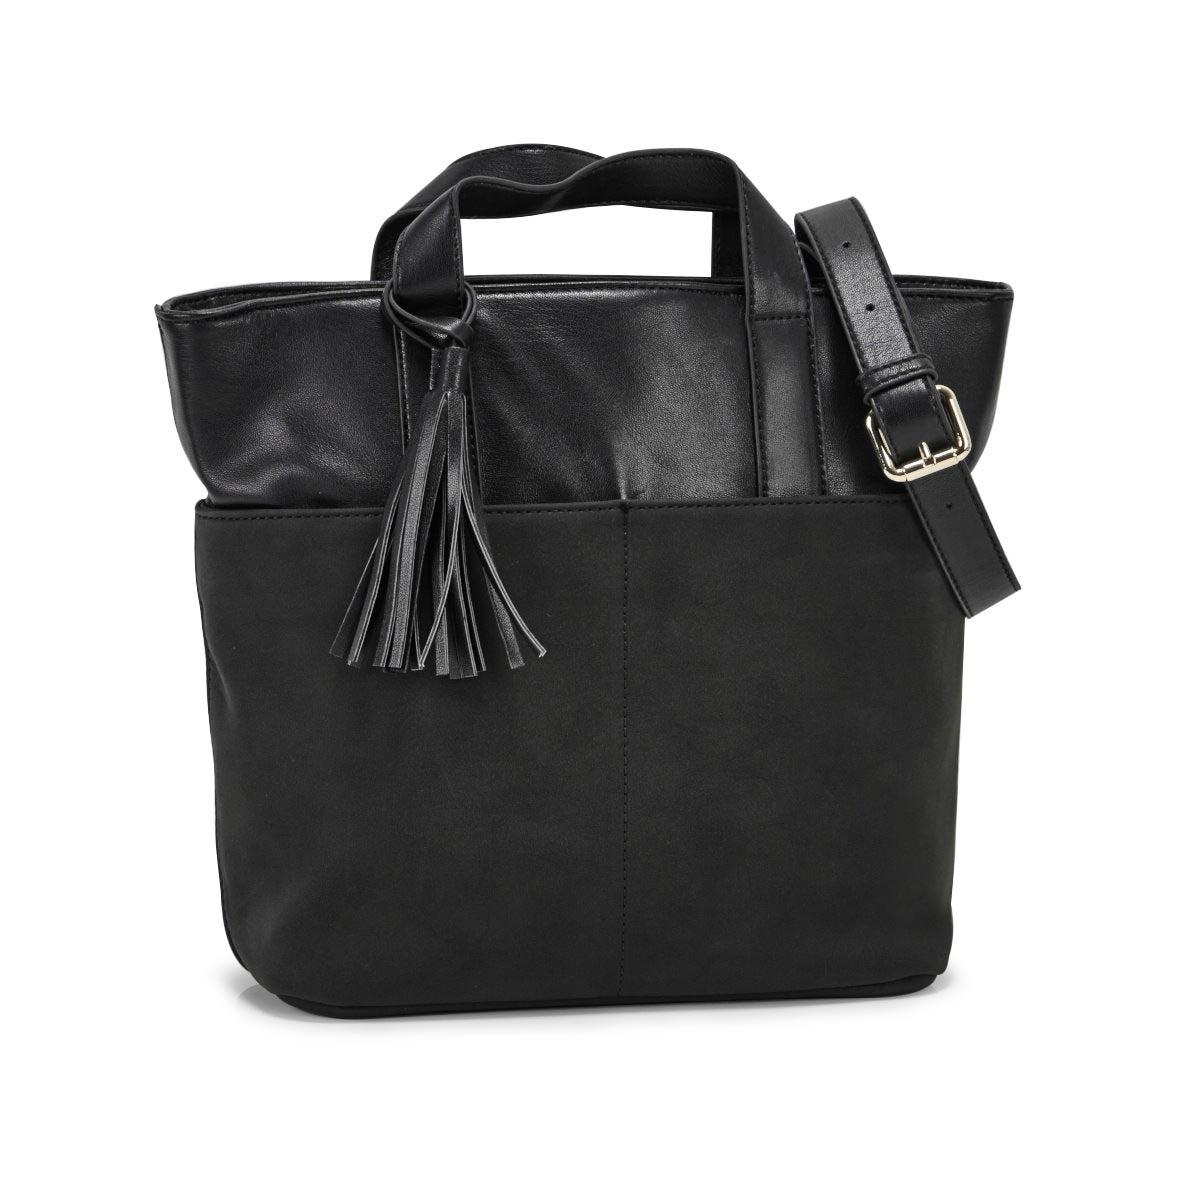 Lds black tassle detail tote bag